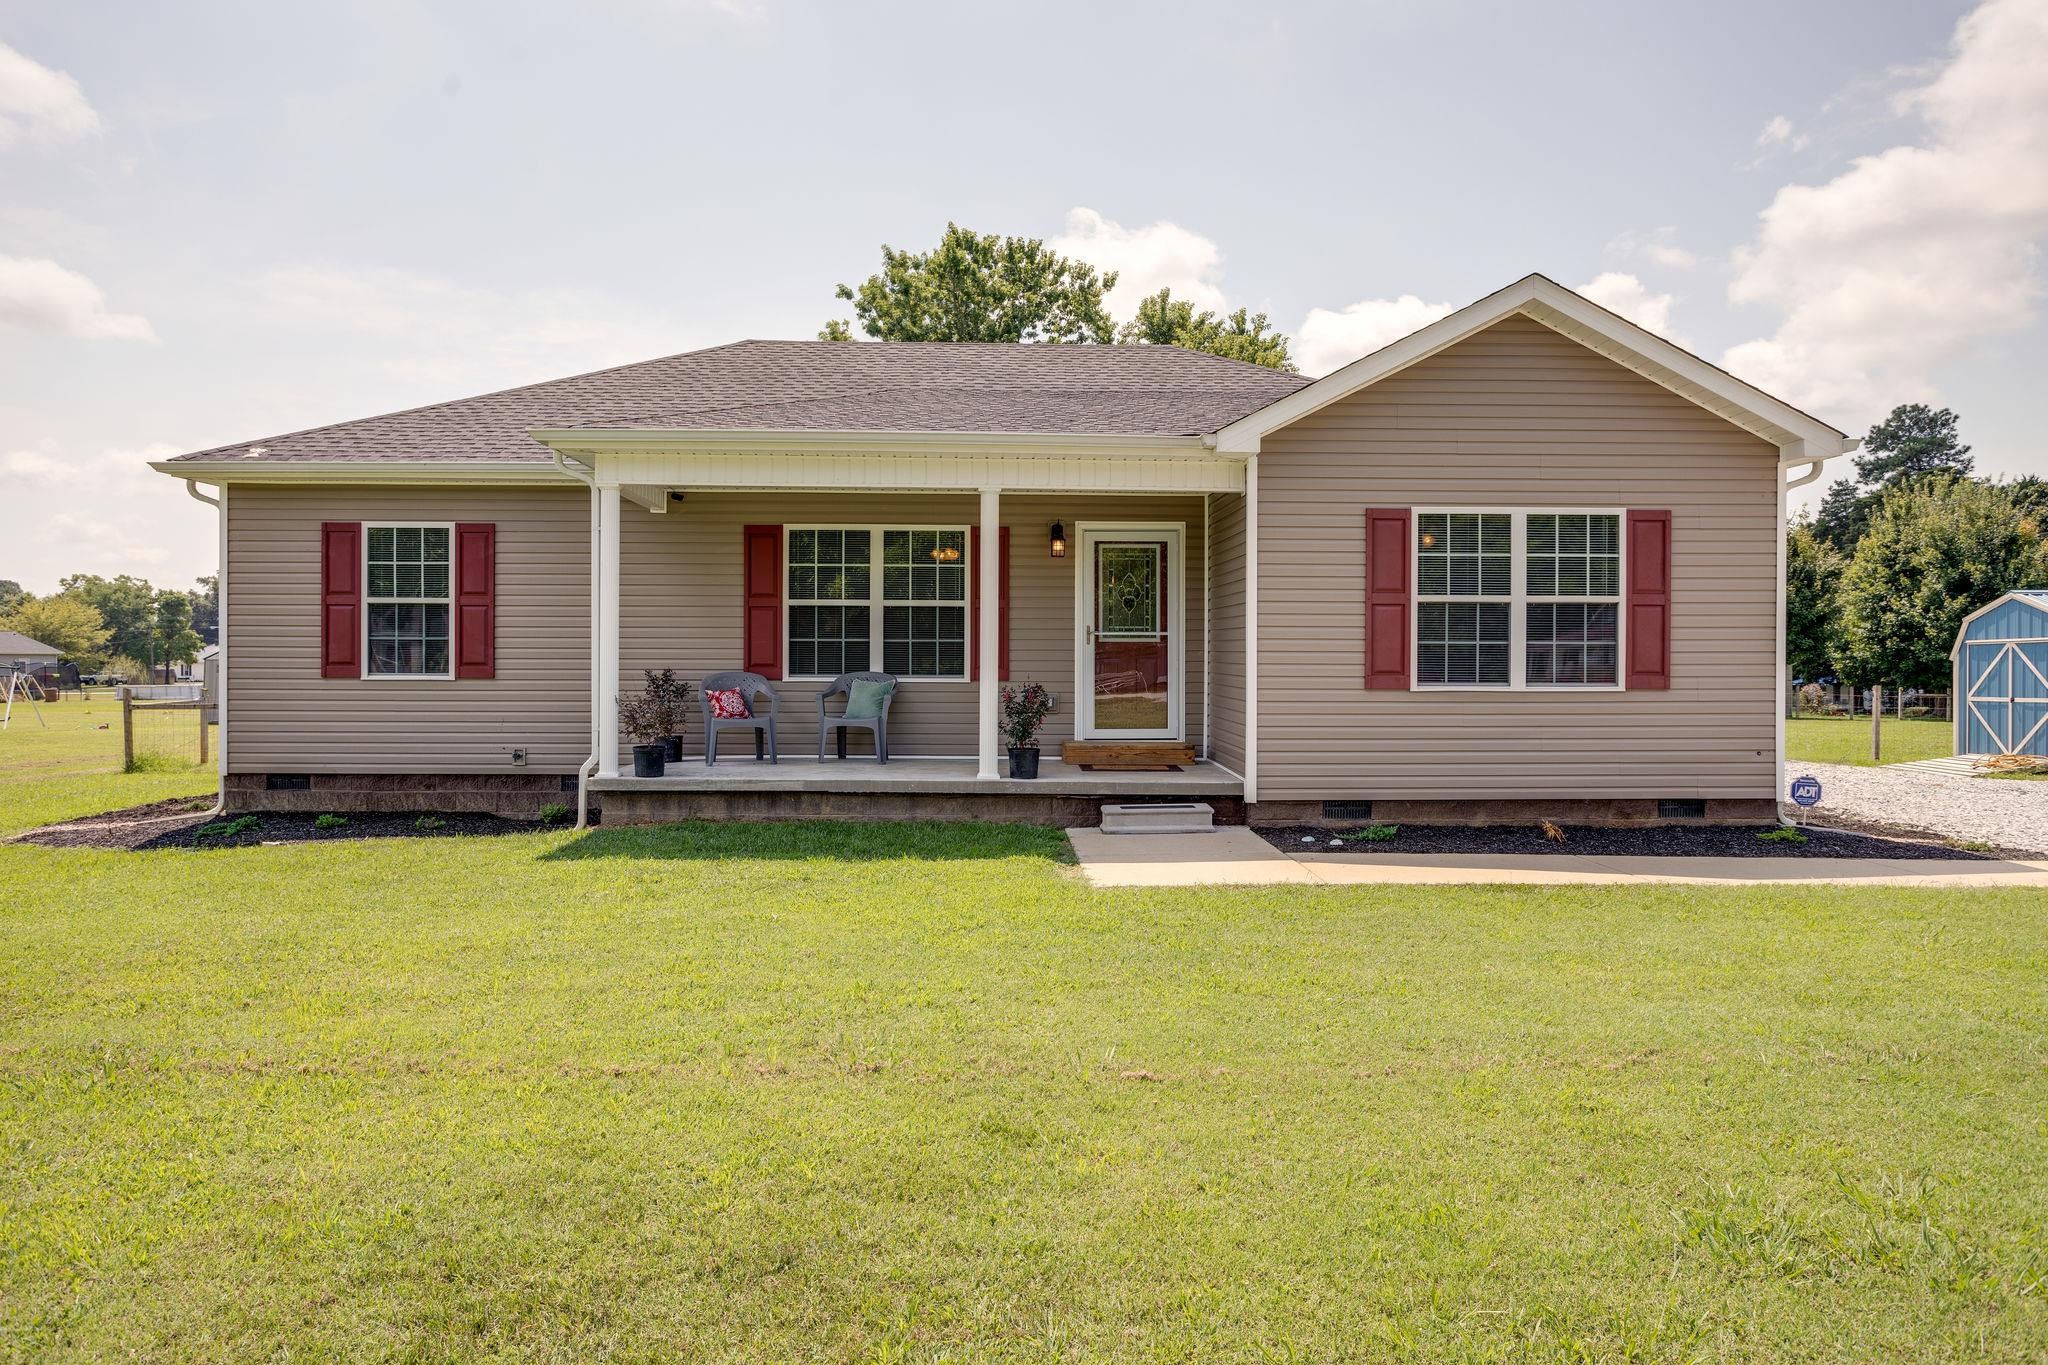 199 Central St, Ethridge, TN 38456 - Ethridge, TN real estate listing